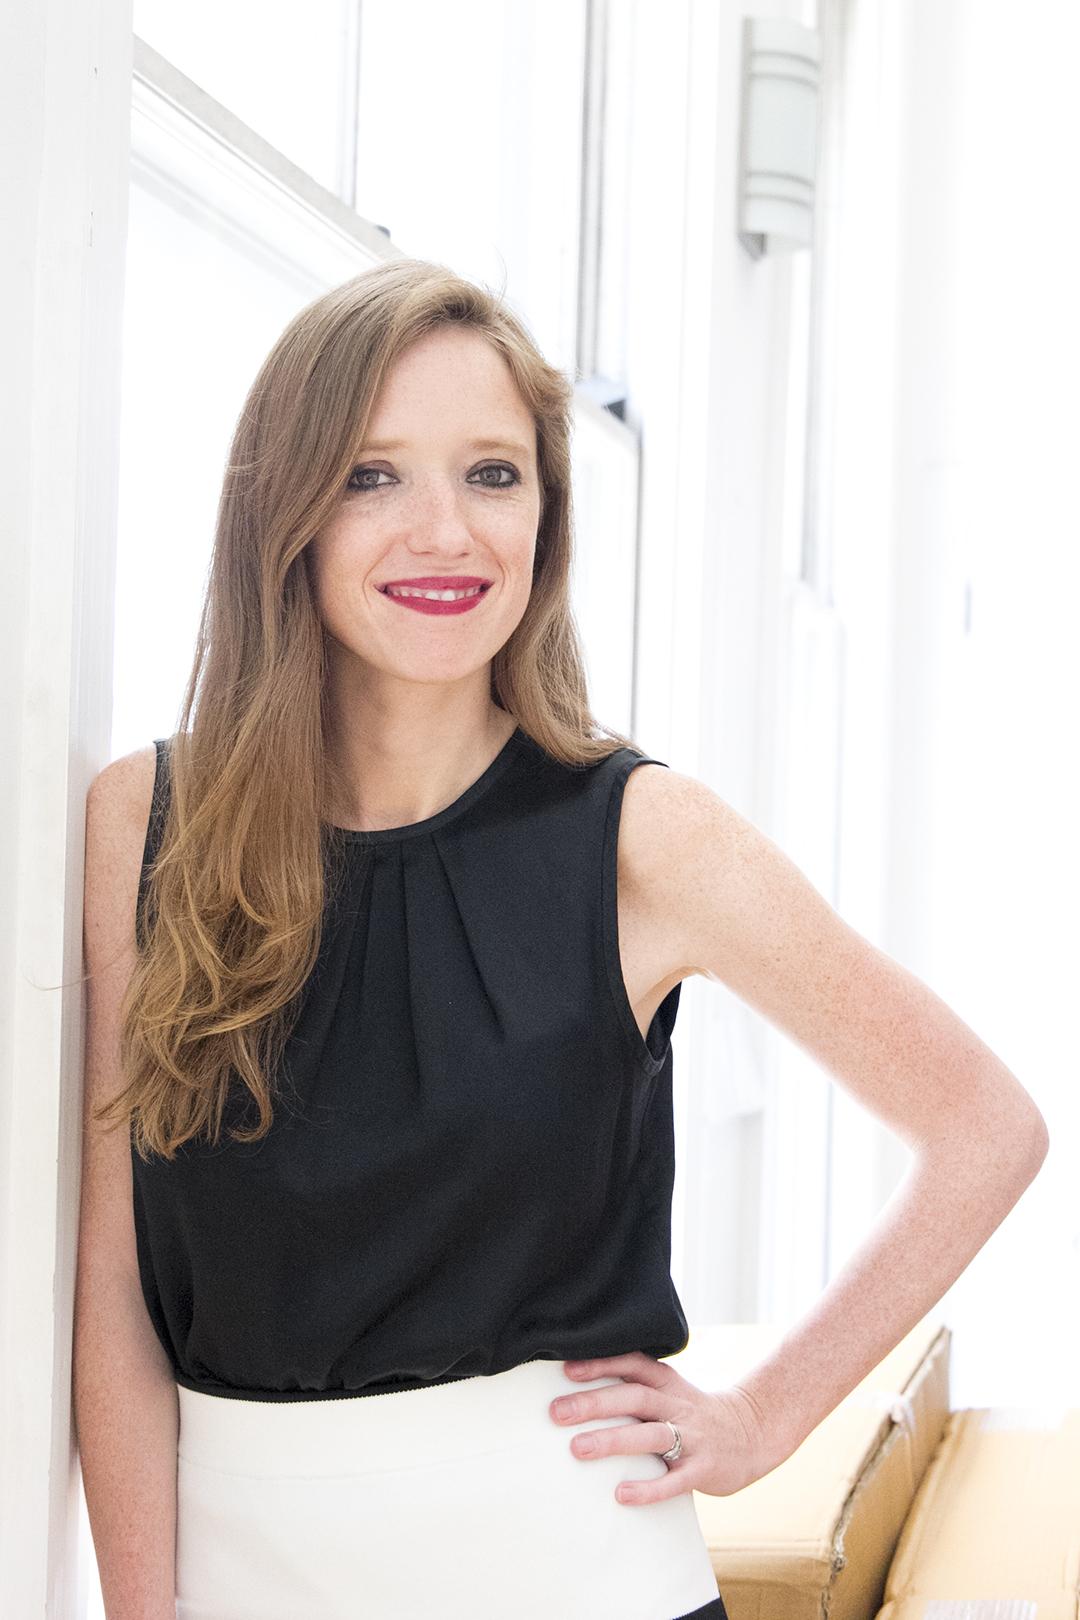 Katherine Ryder, CEO of Maven Clinic